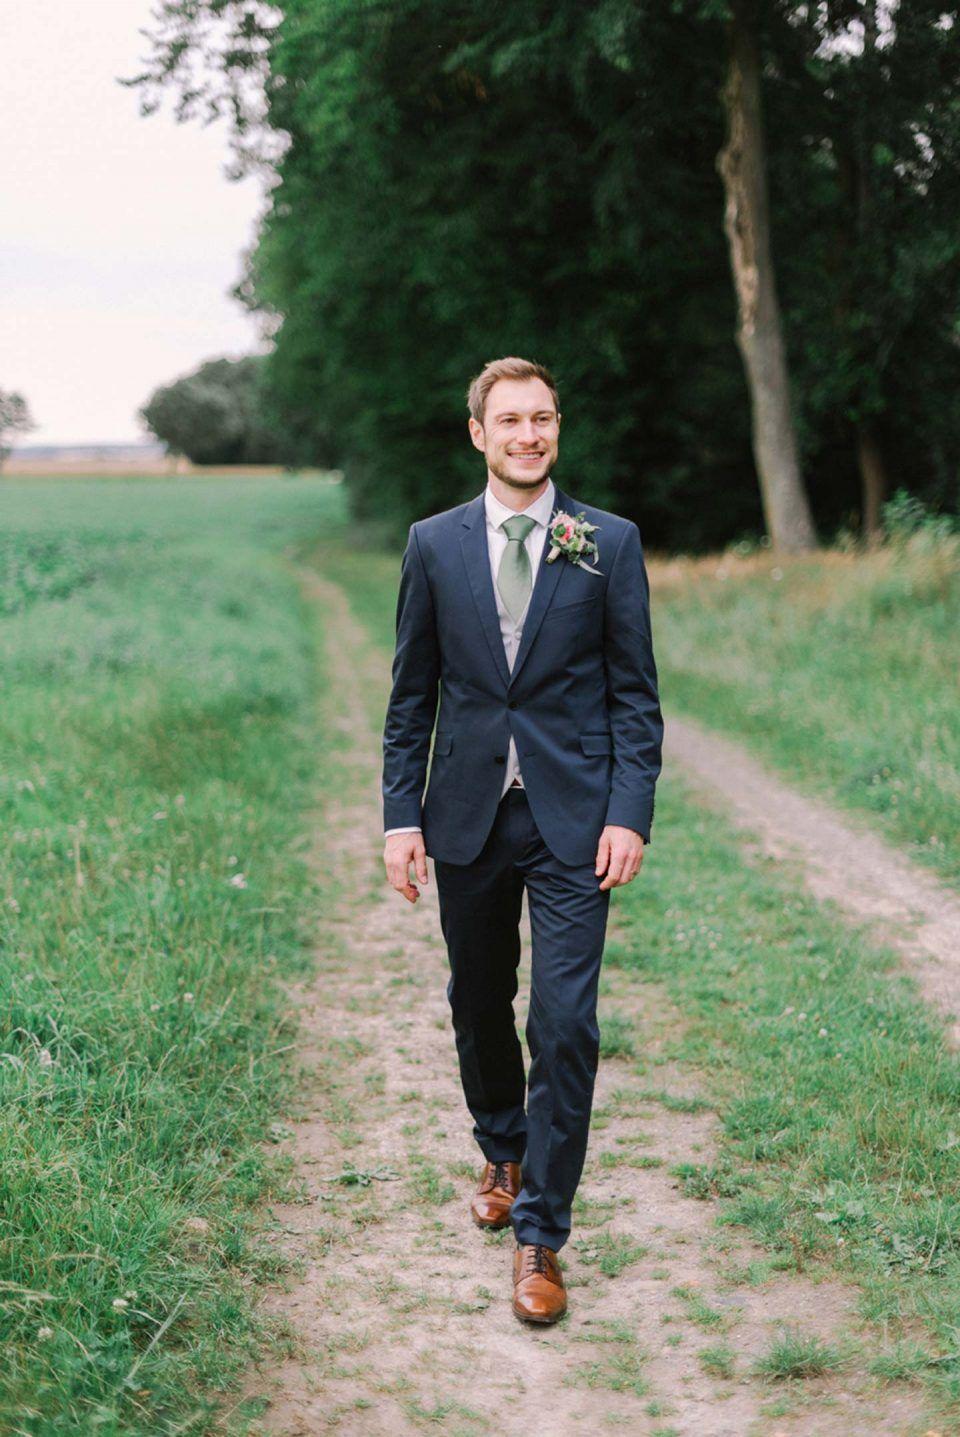 Natalia Carlo Shabby Chic Hochzeit Im Rittergut Altenrode Shabby Chic Hochzeitswahn Und Rittergut